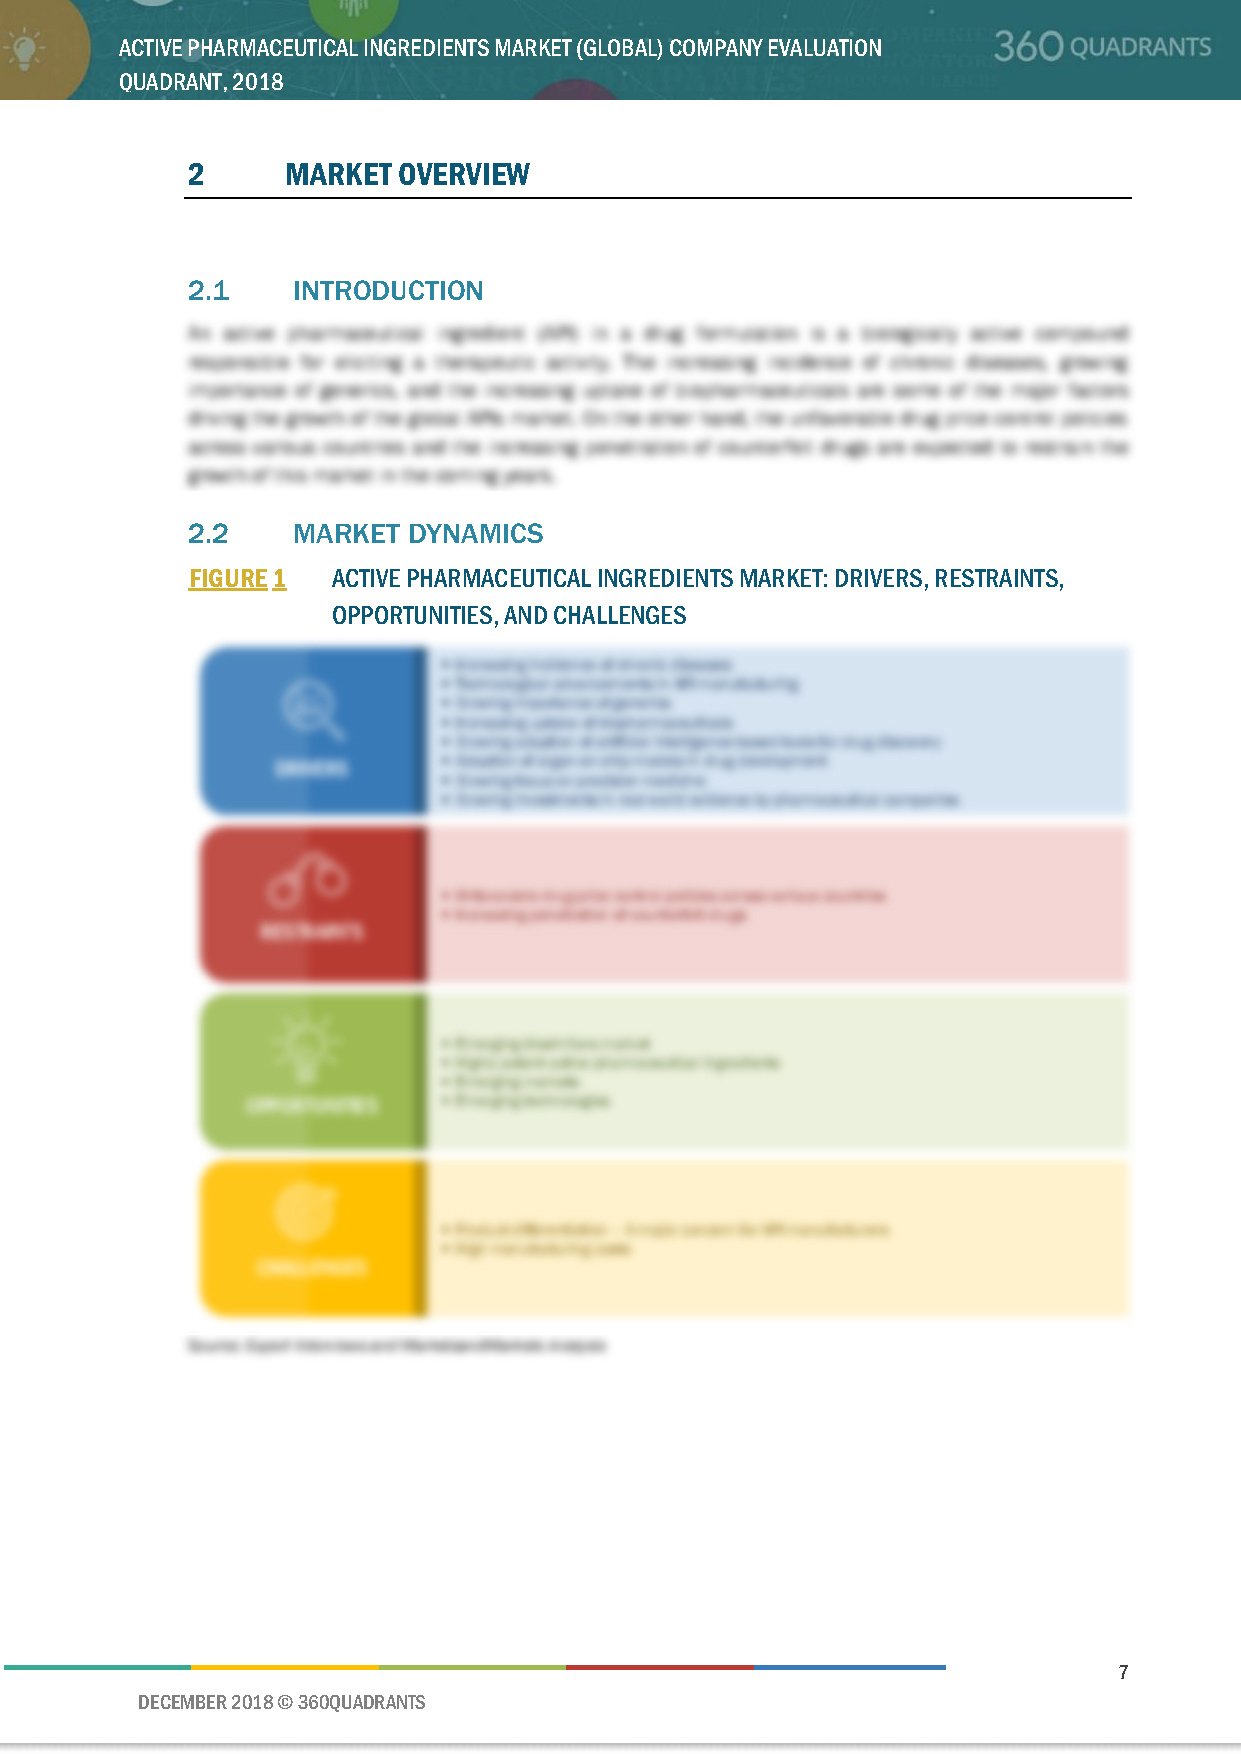 Active Pharmaceutical Ingredient Trends